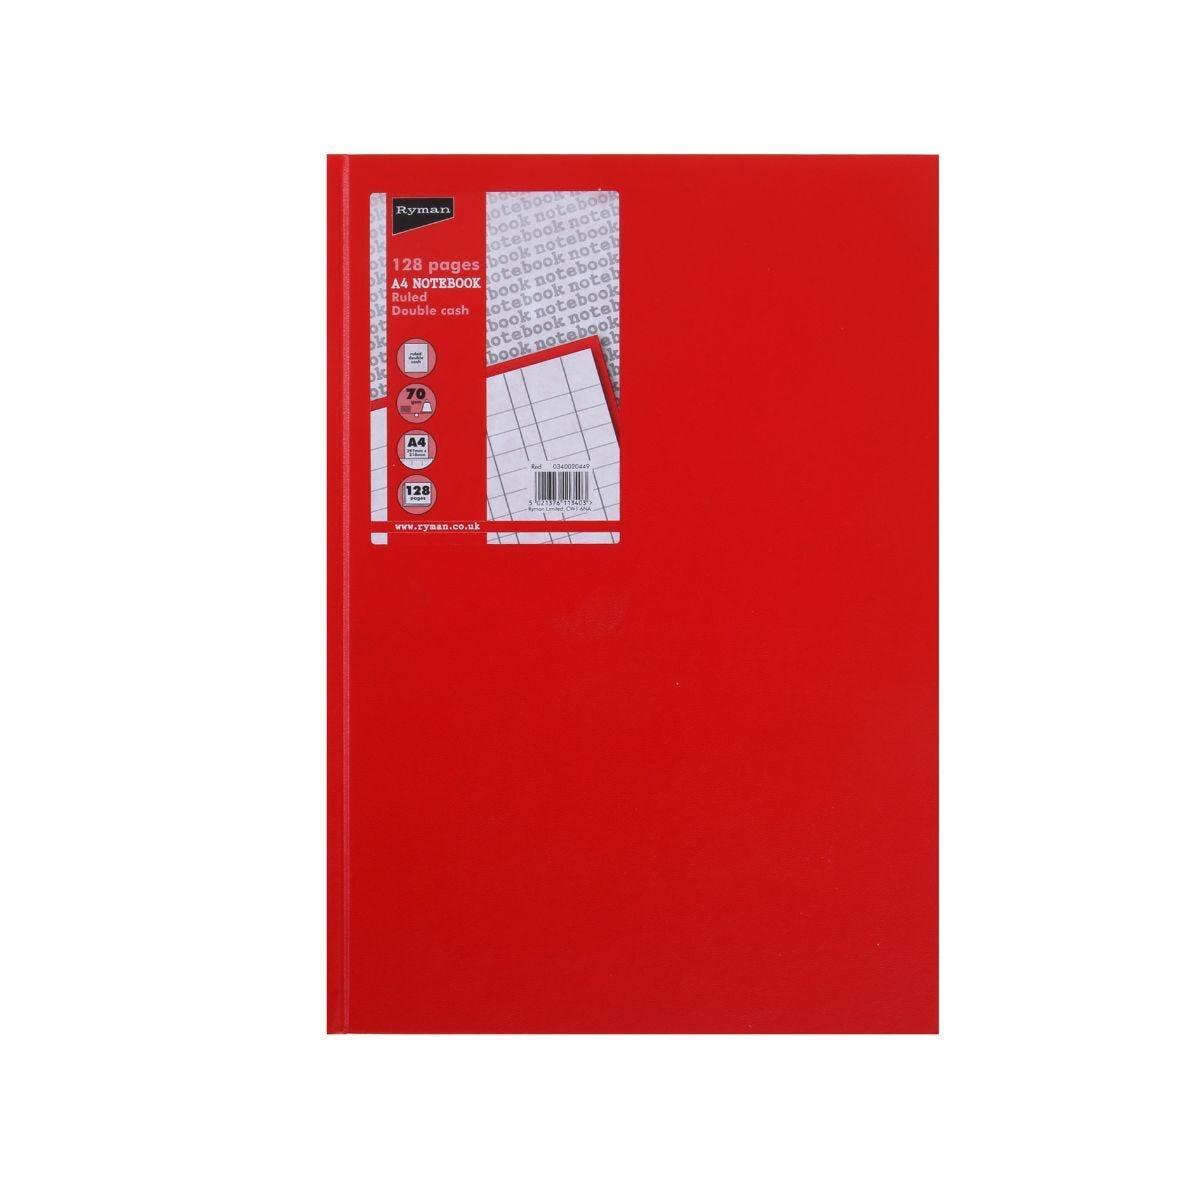 Ryman Casebound Memo Book Double Cash A4 128 Pages 70gsm